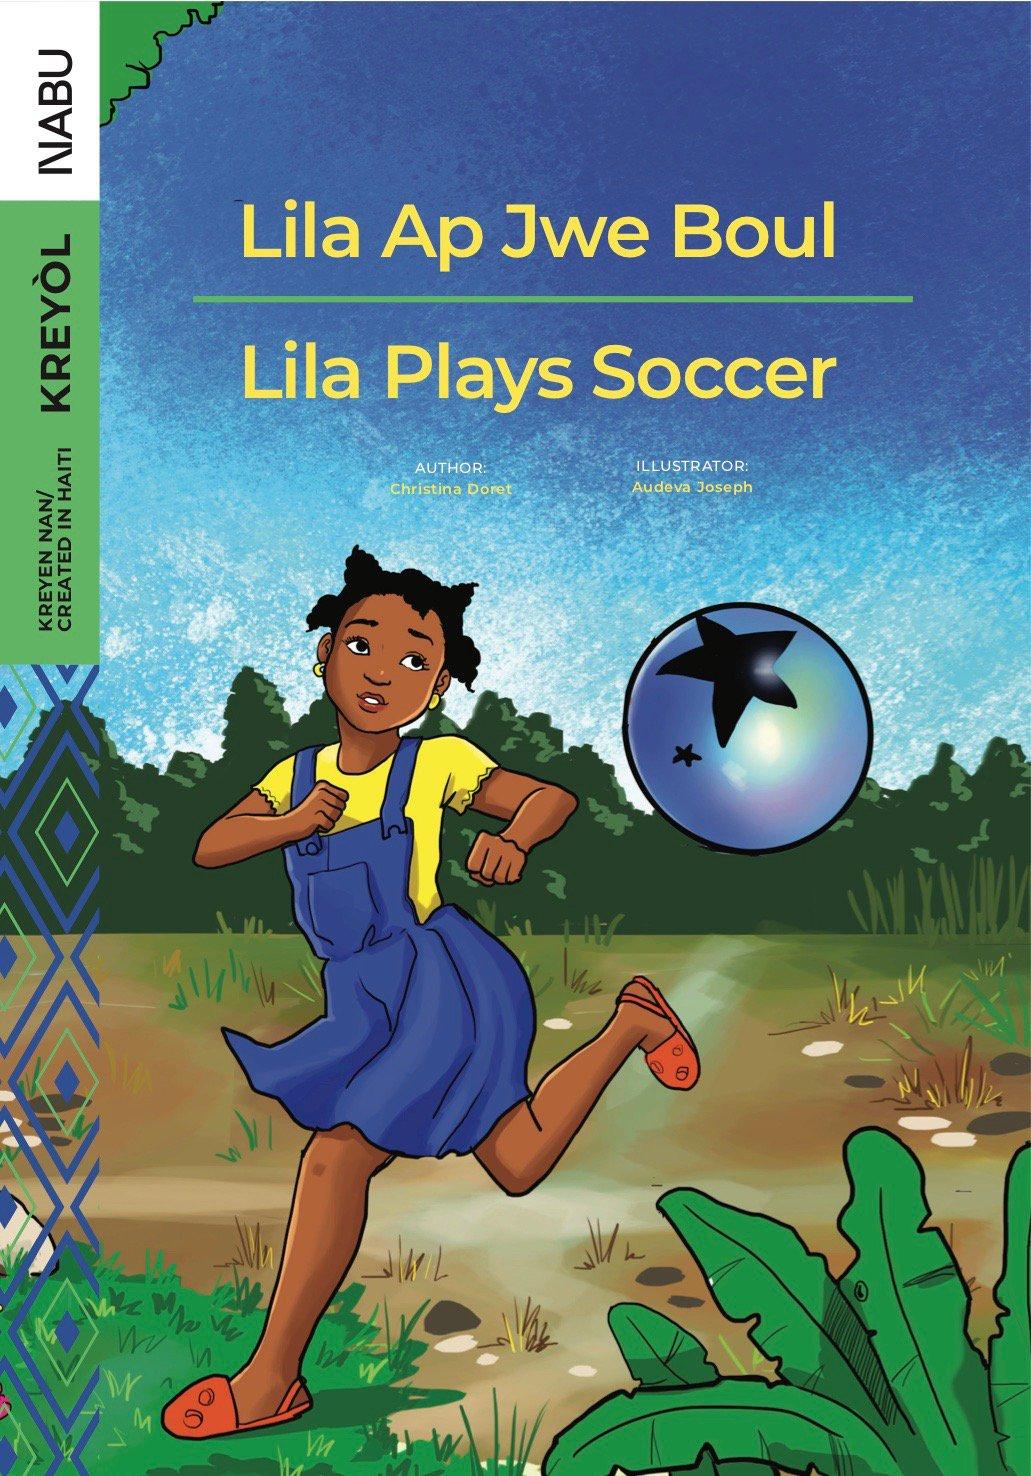 Lila Plays Soccer 2.jpeg